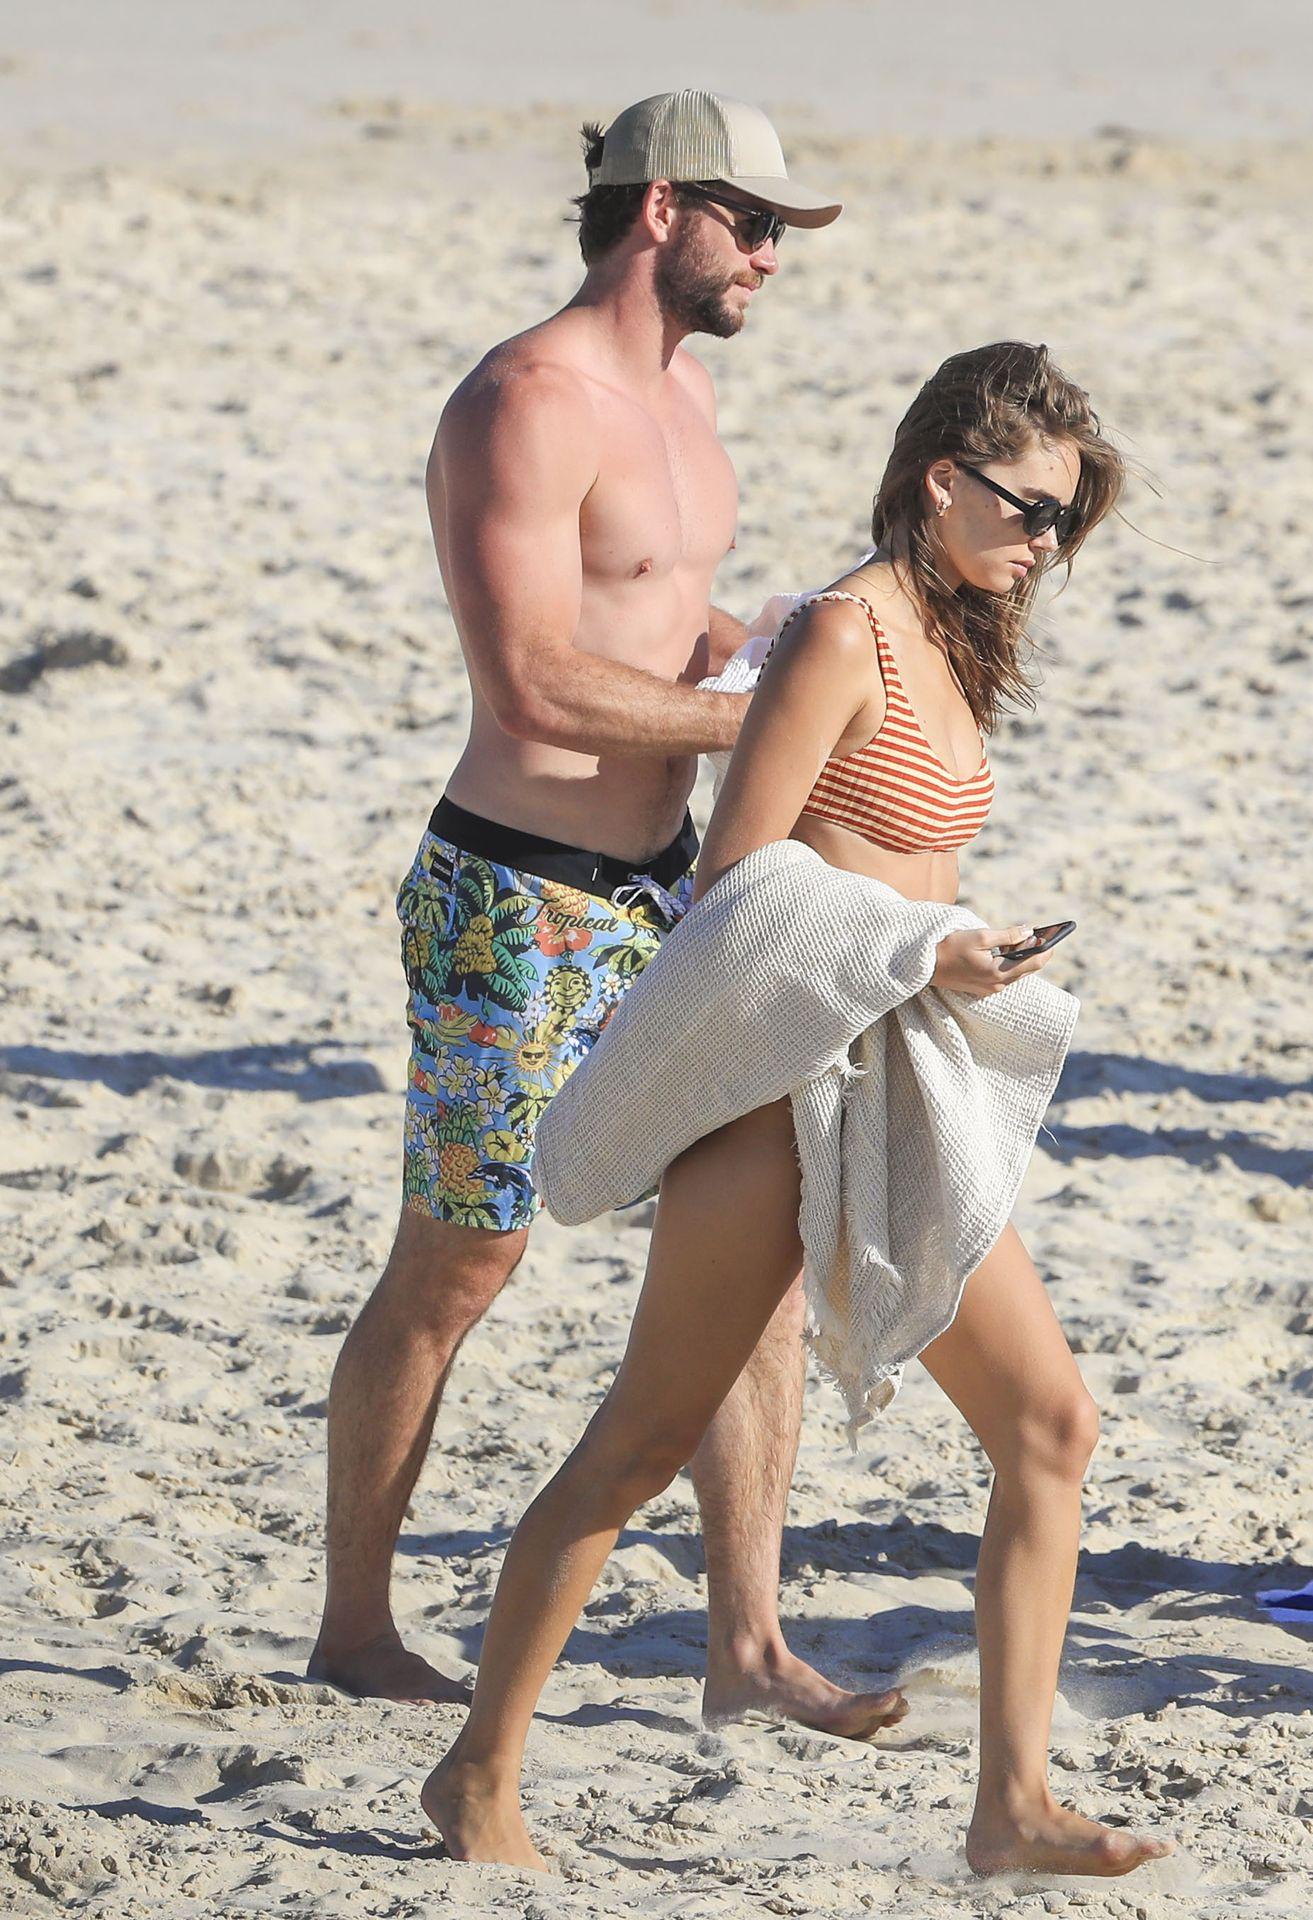 Gabriella Brooks Hot – Liam Hemsworth's New Girlfriend 0064